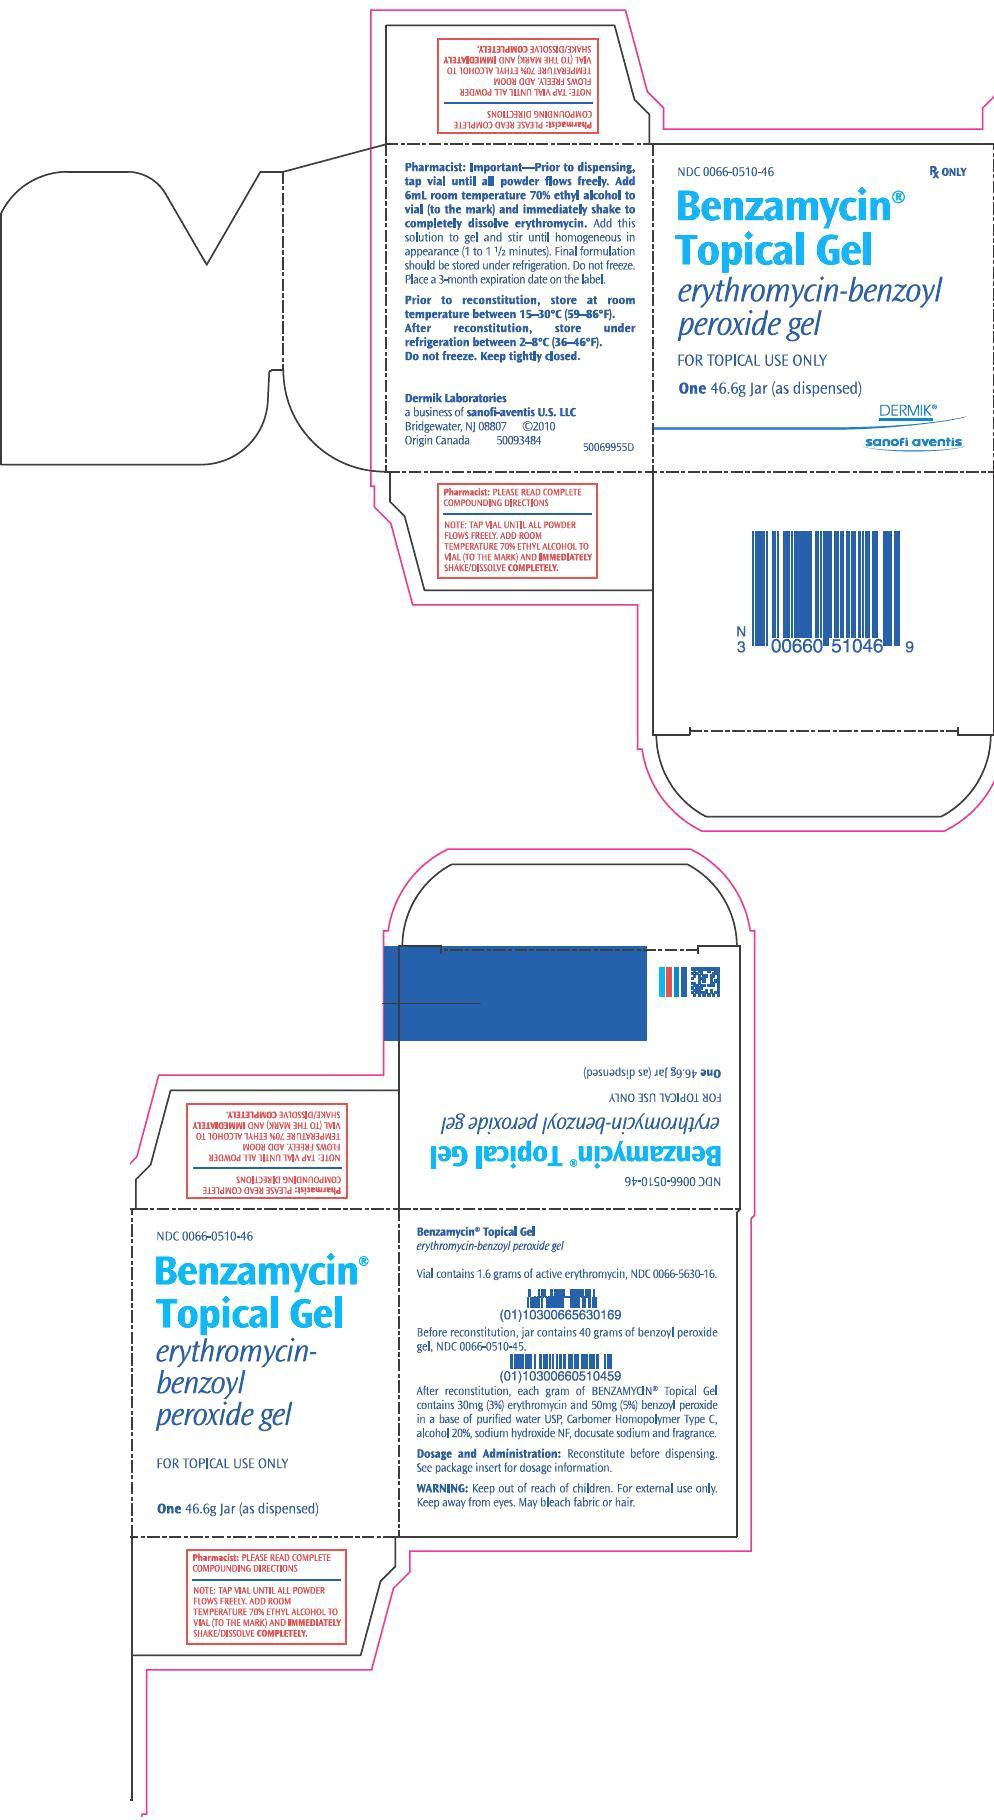 Benzoyl Peroxide-Erythromycin Topical Benzoyl Peroxide-Erythromycin Topical new images